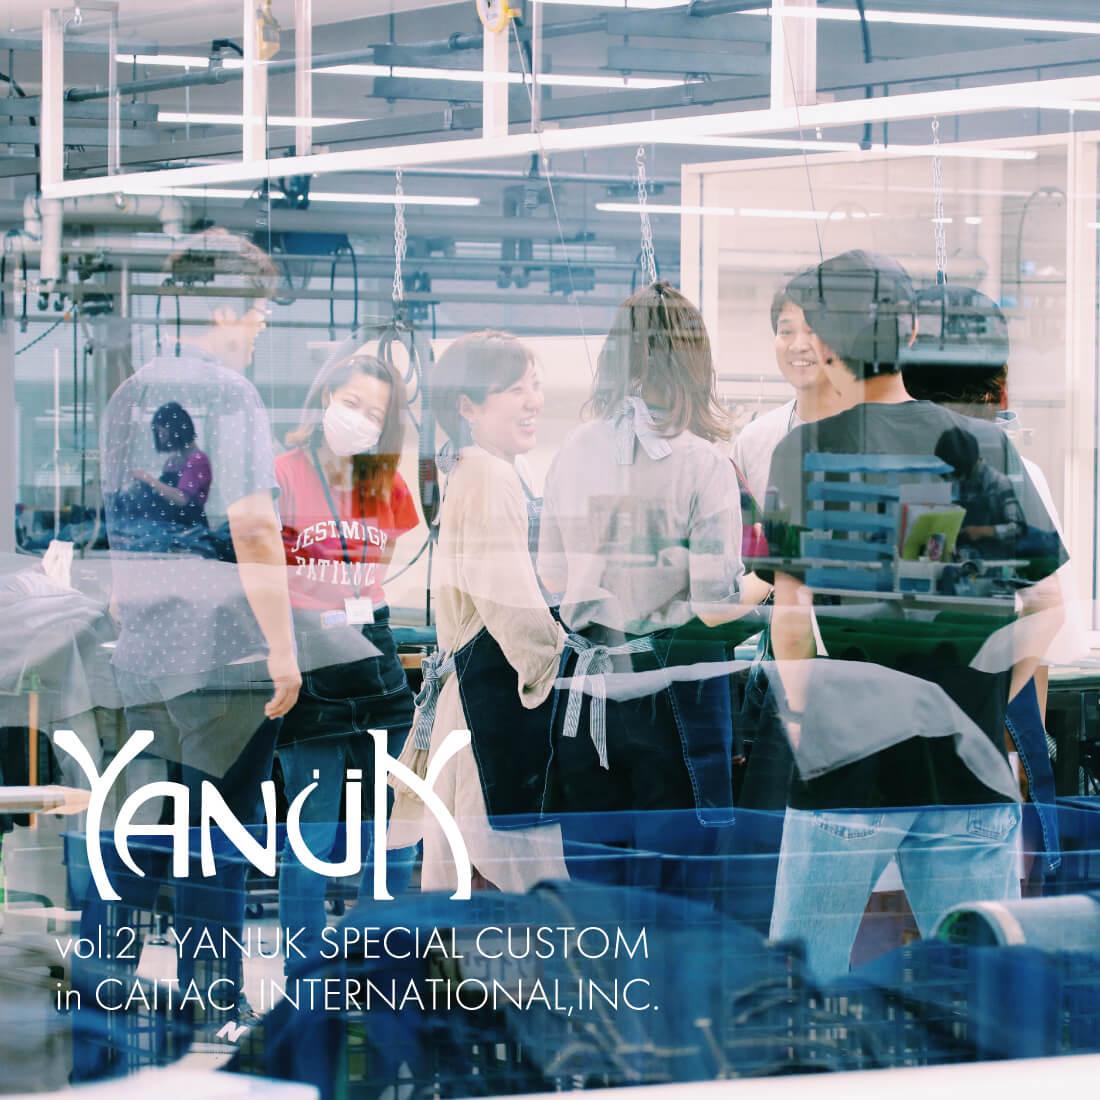 YANUK,ヤヌーク,デニム加工体験,カイタックインターナショナル,ジーンズファクトリー